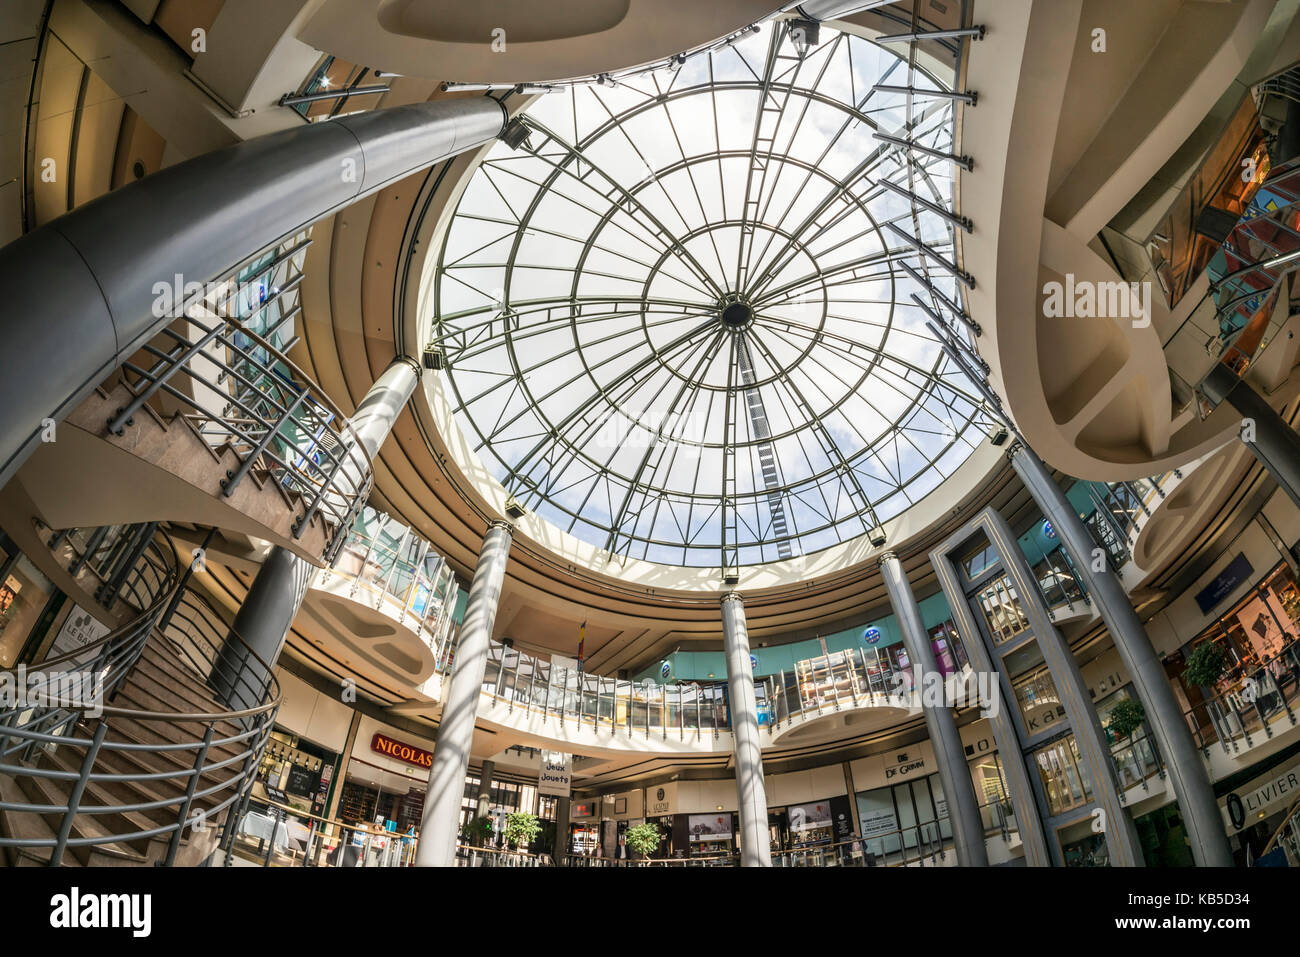 Grand Hommes, shopping center, interieur, Bordeaux, France - Stock Image